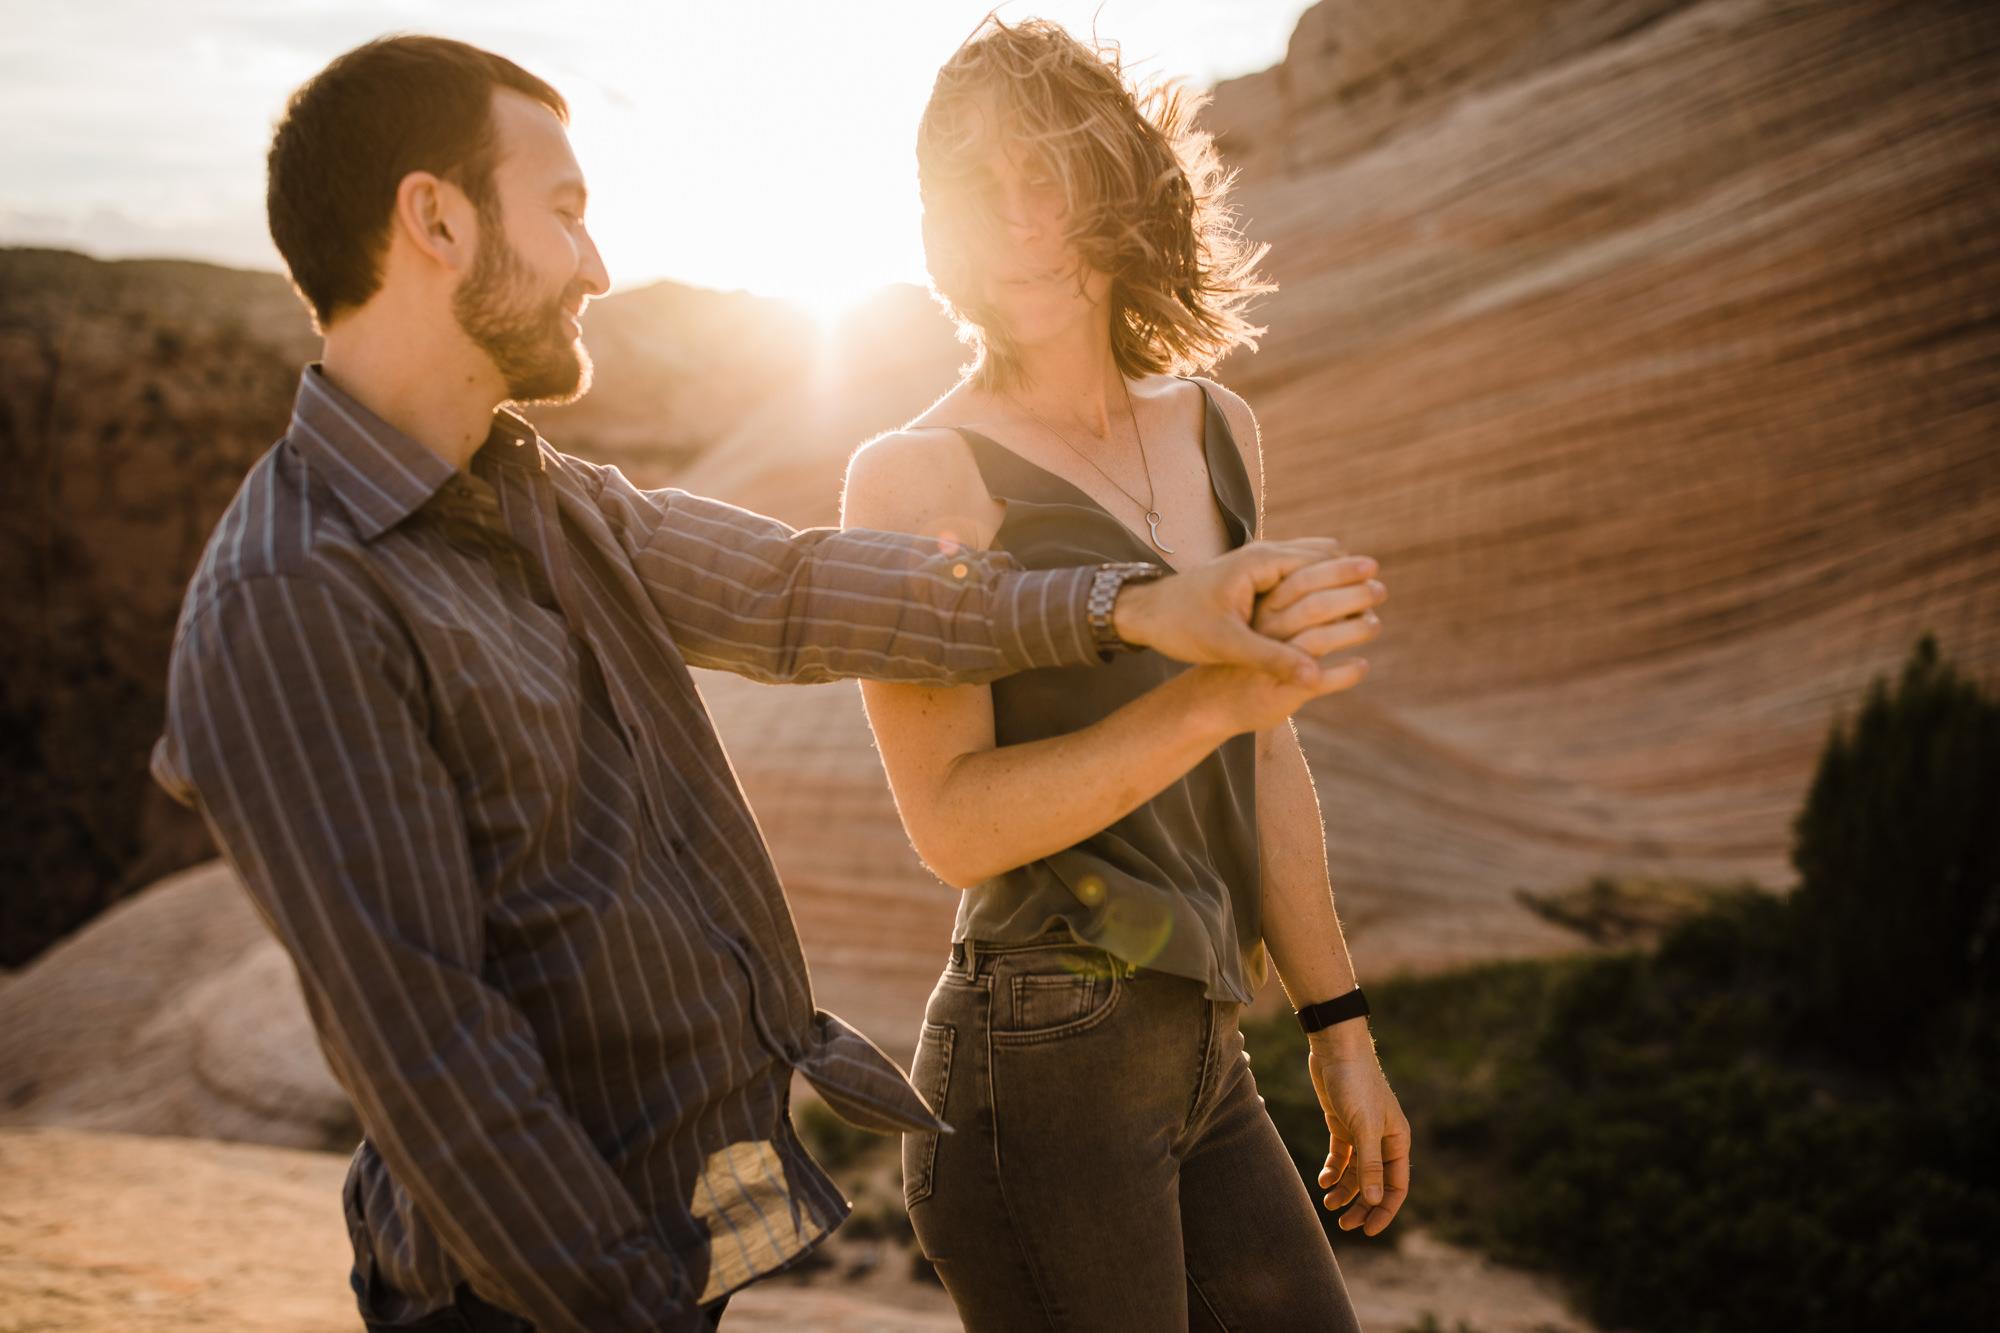 windy engagement session in the utah desert | destination engagement photo inspiration | utah adventure elopement photographers | the hearnes adventure photography | www.thehearnes.com